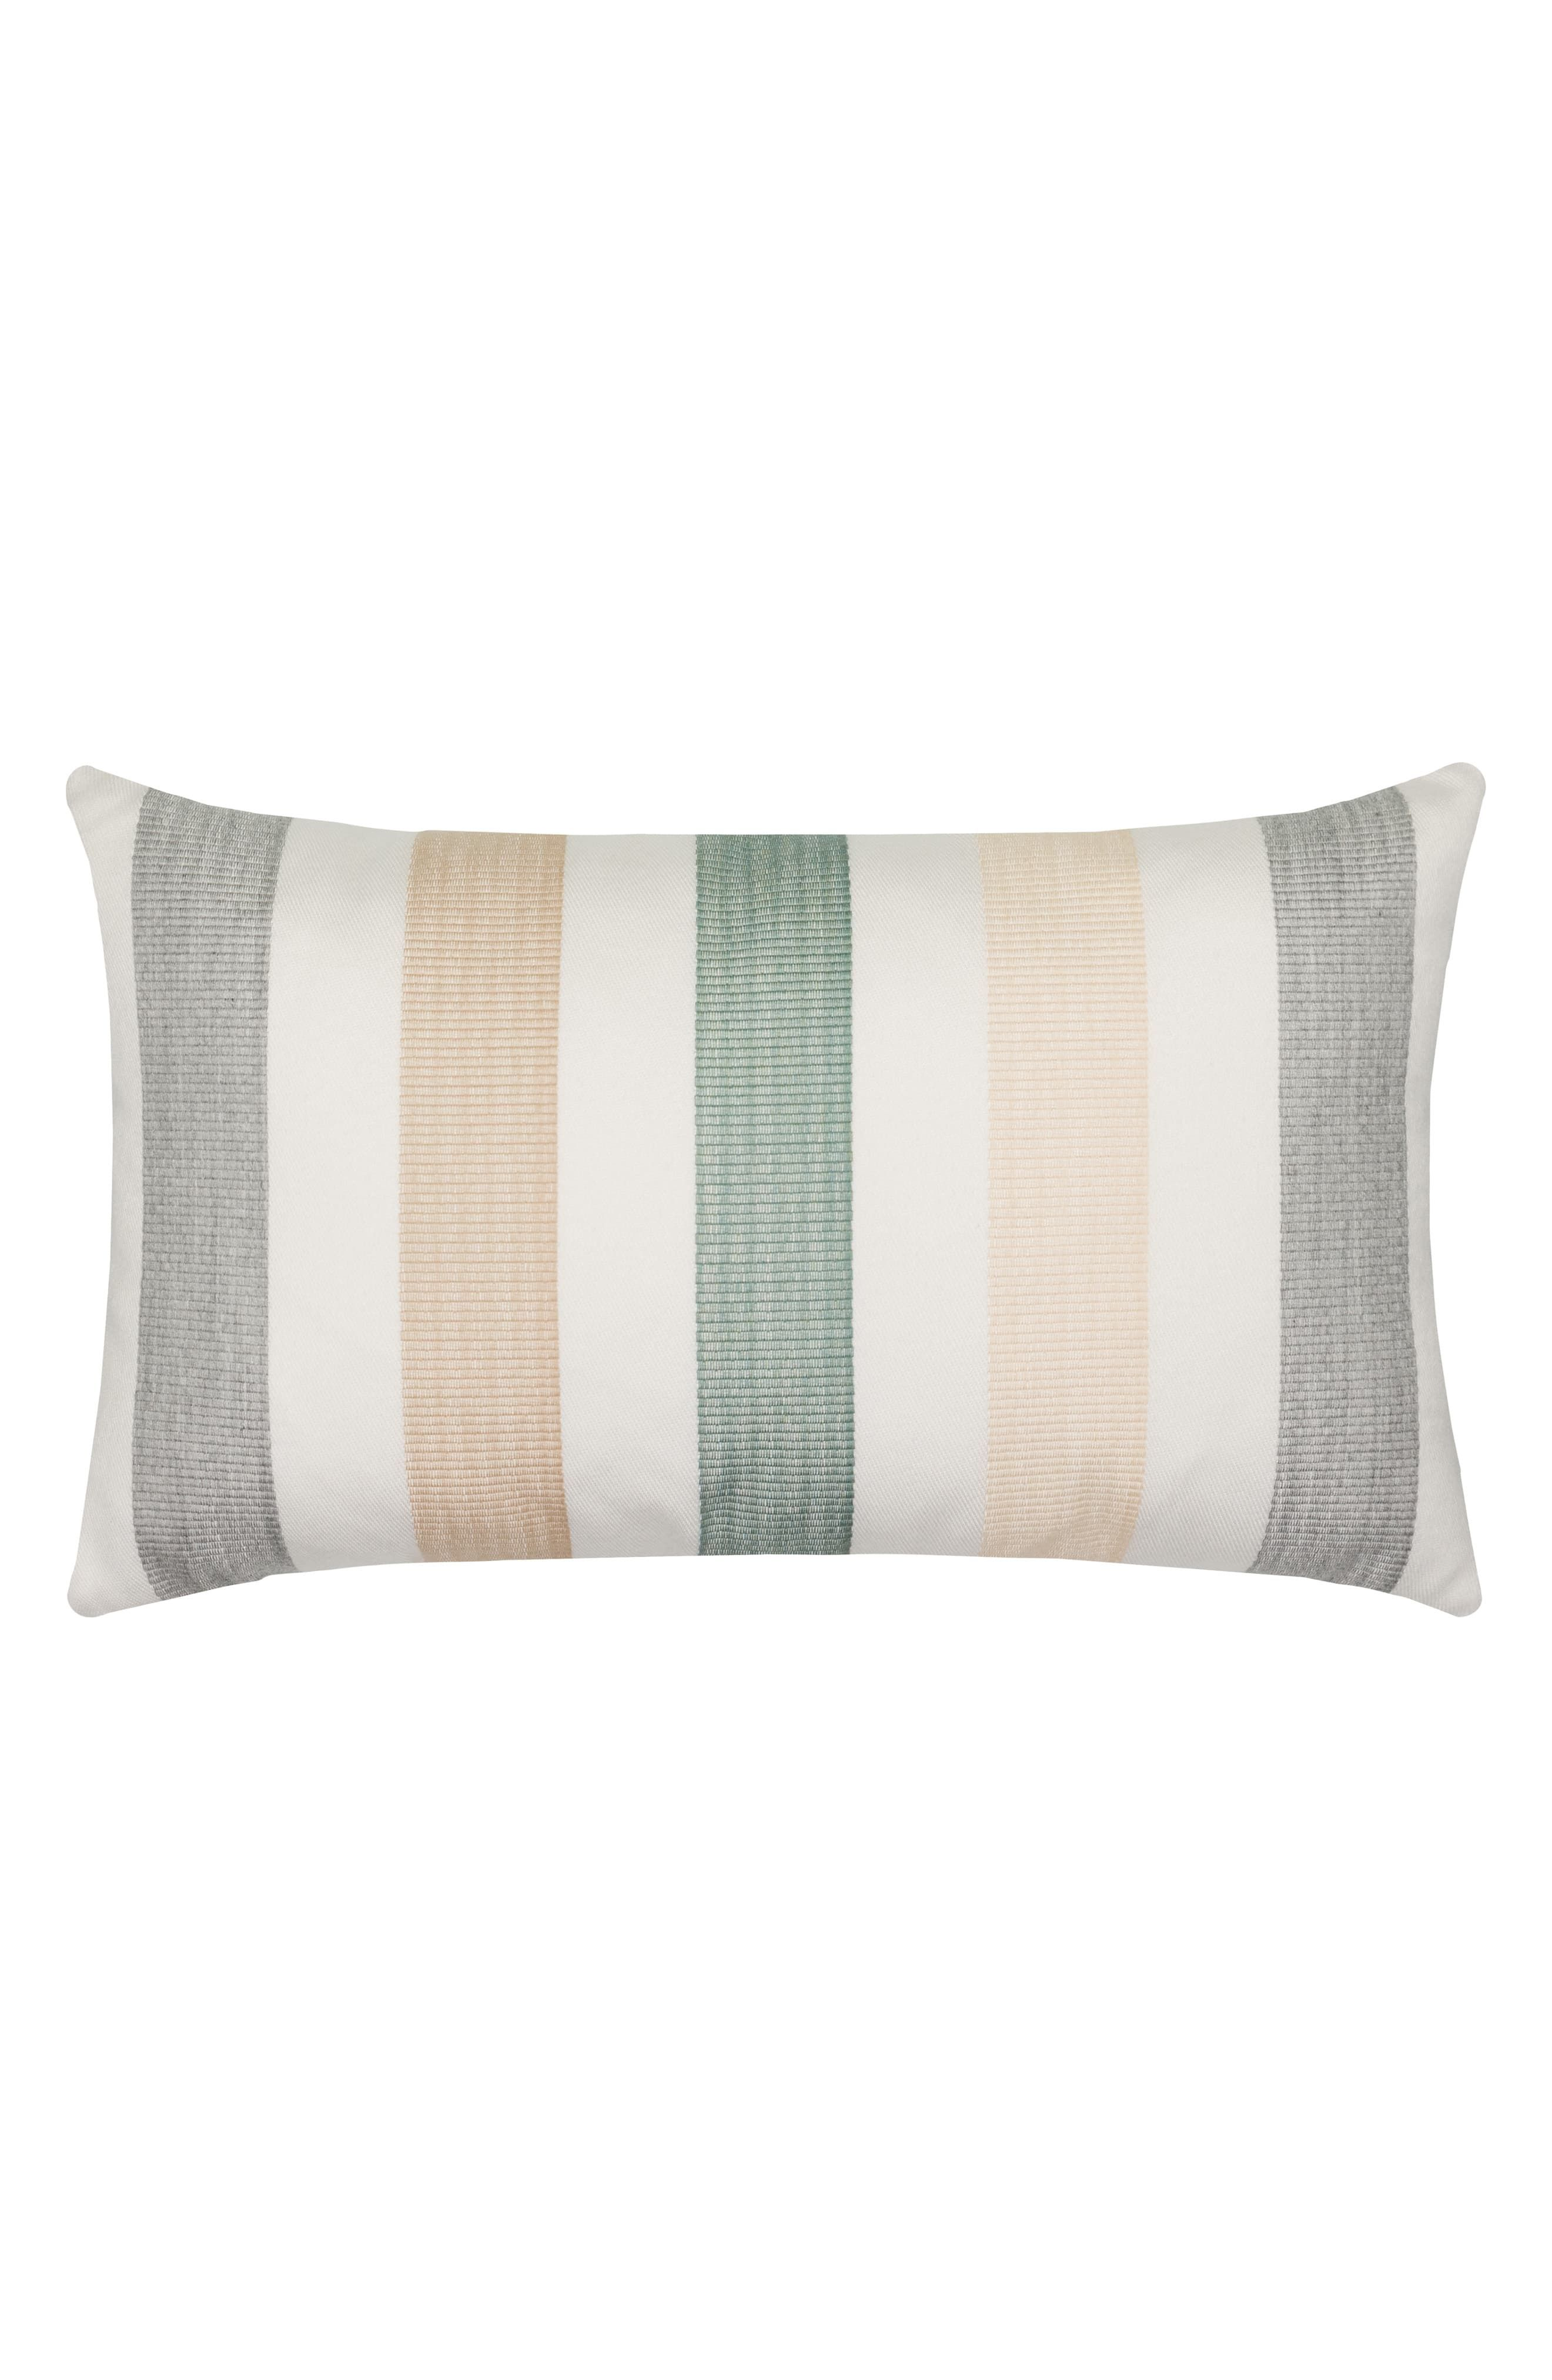 Elaine Smith Axiom Indoor Outdoor Lumbar Accent Pillow Size One Size Beige Pillows Accent Pillows Pillow Design